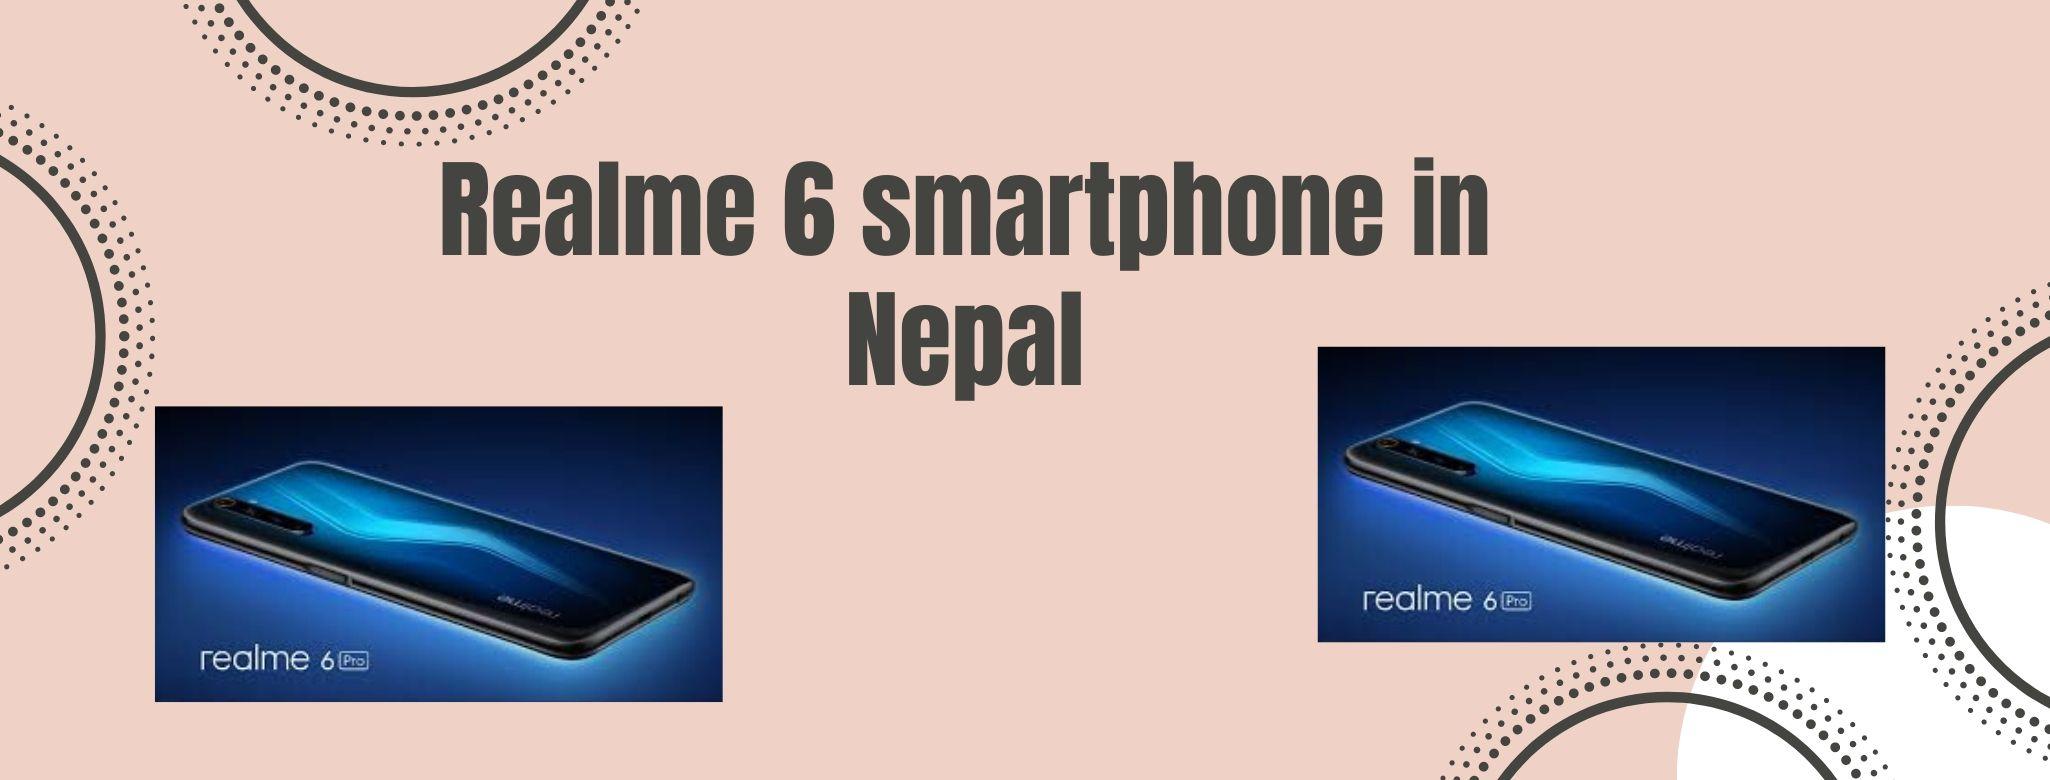 Realme 6 smartphone in Nepal